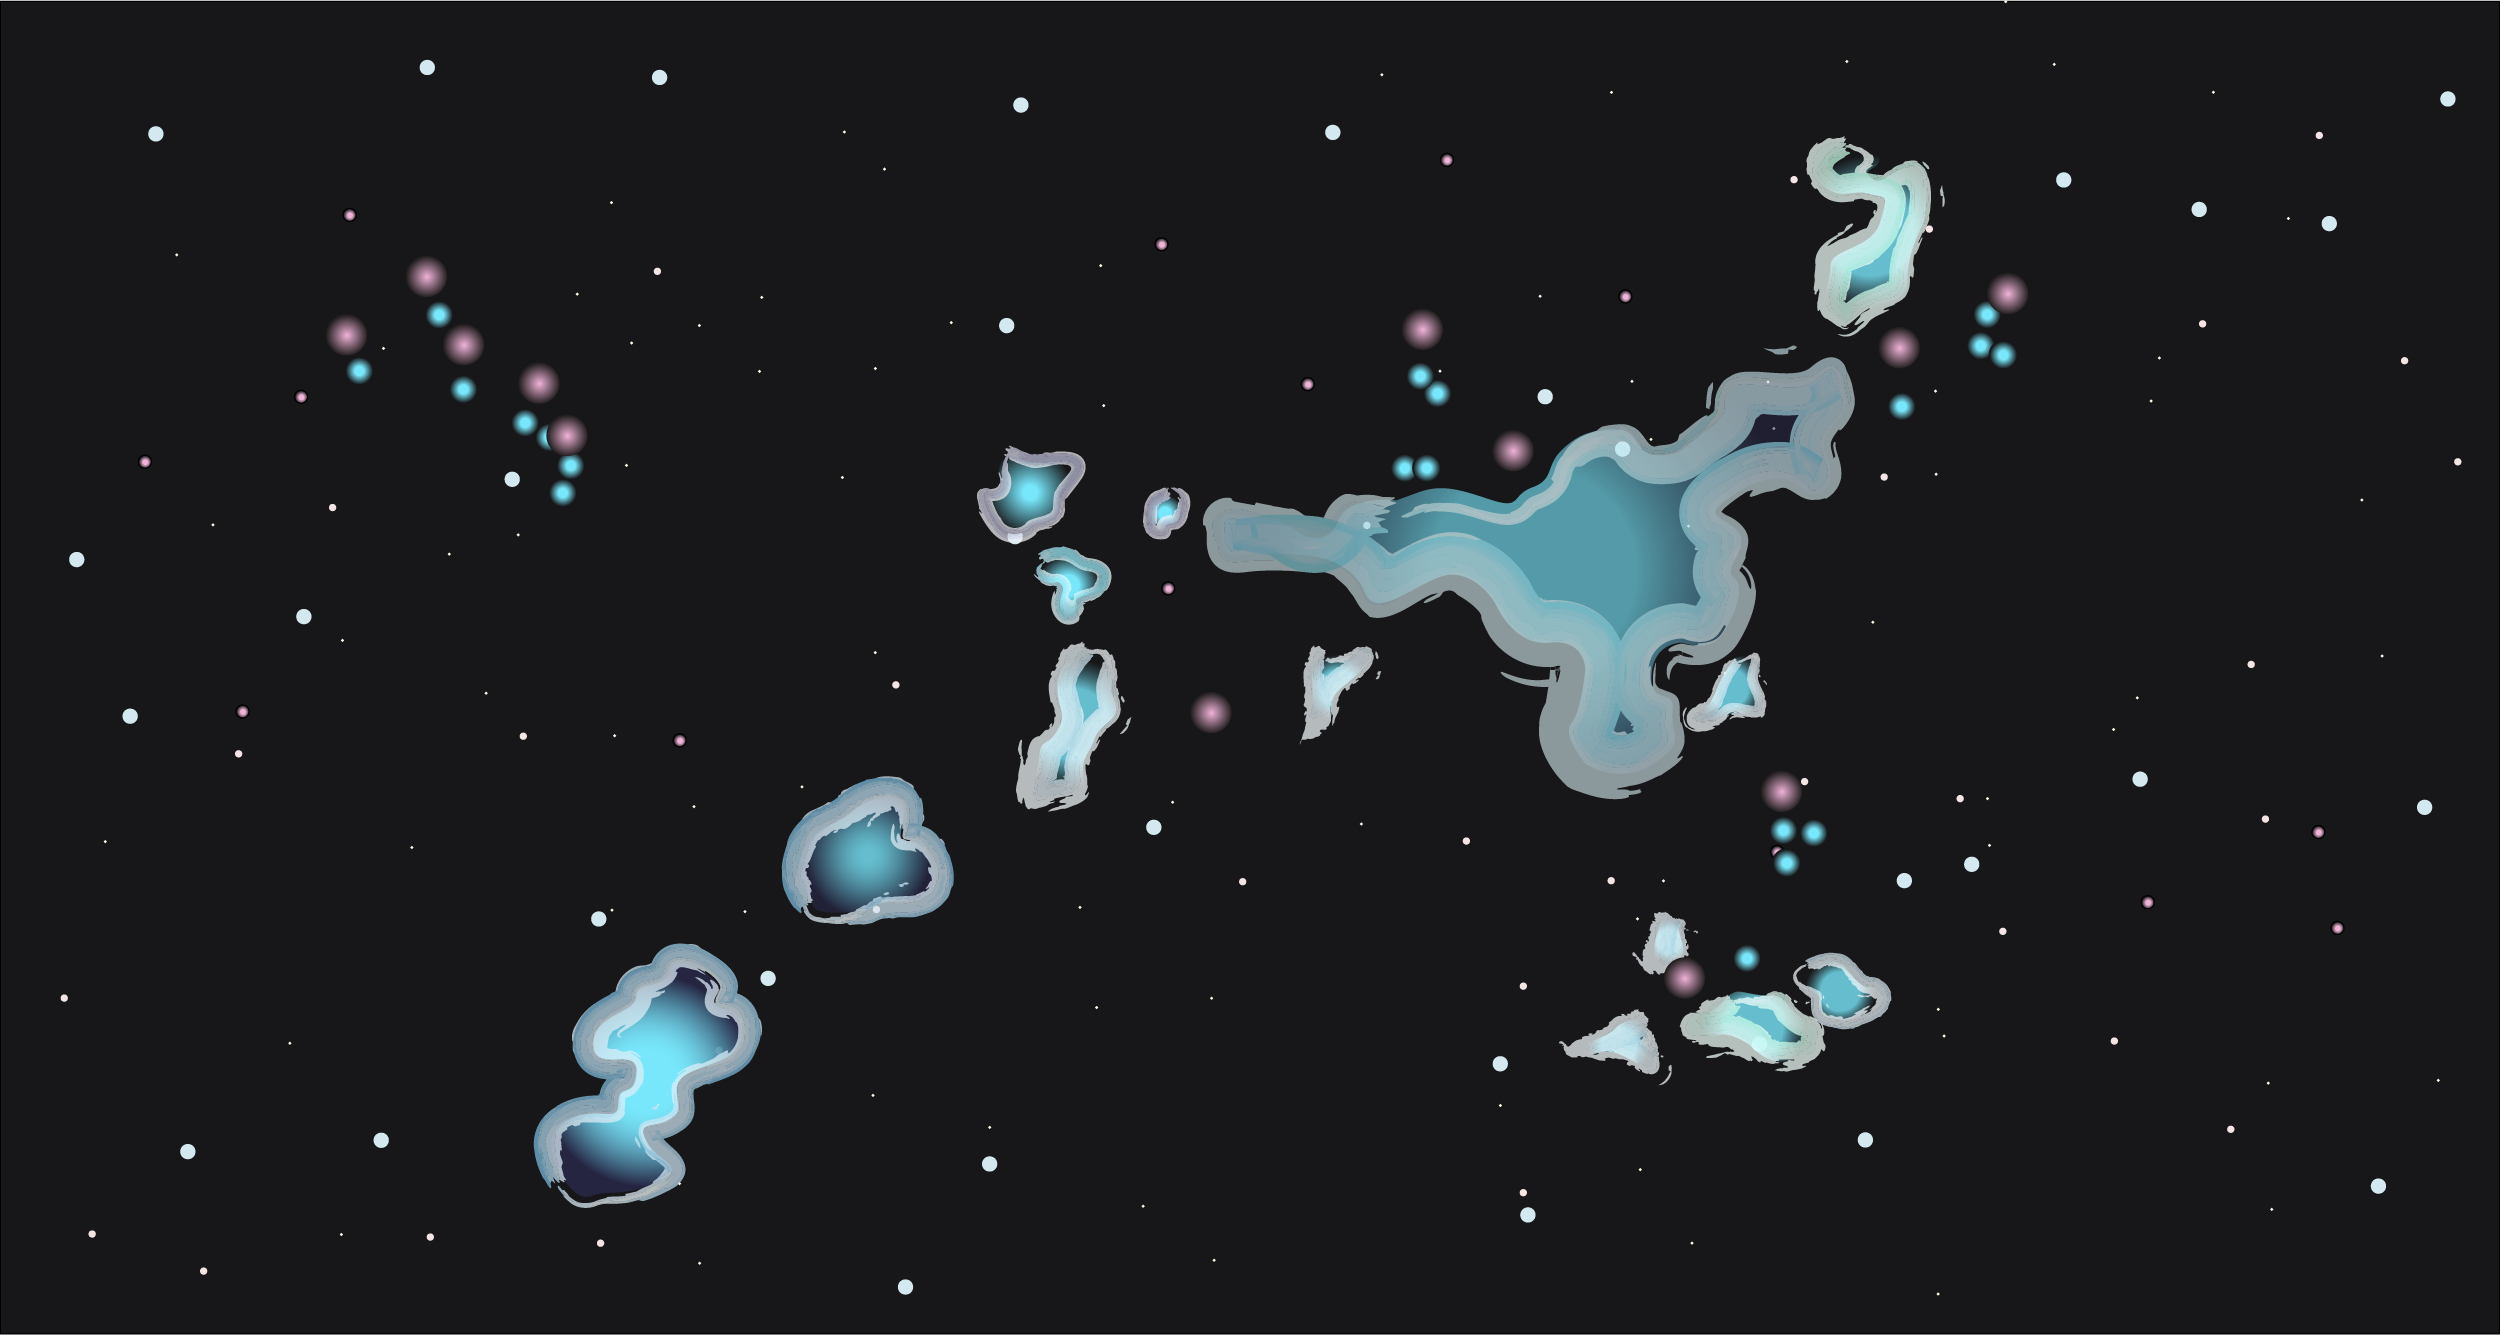 Virgo_Supercluster_Sans_Galaxies.png